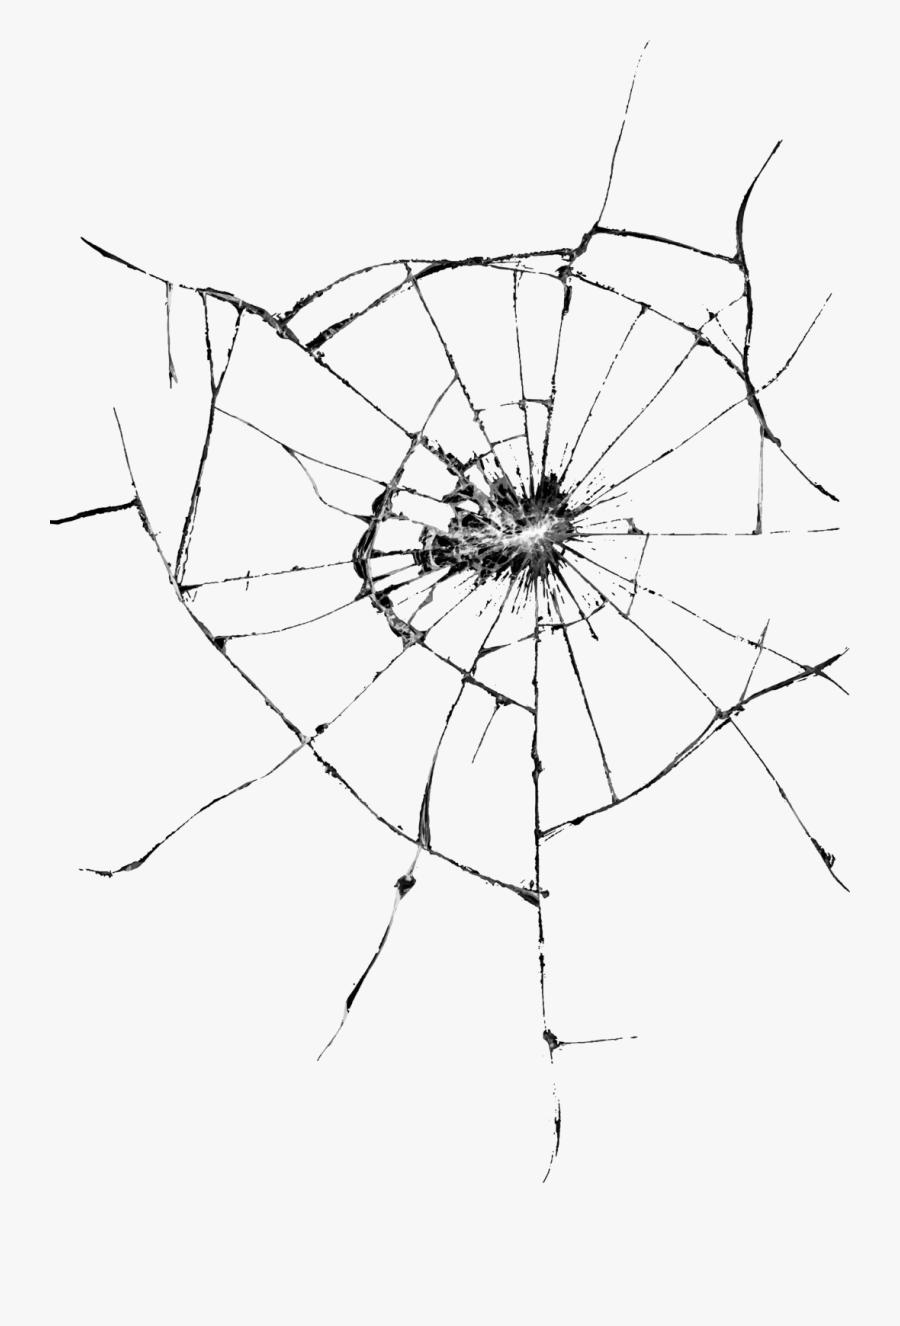 Transparent Broken Glass Drawing, Transparent Clipart